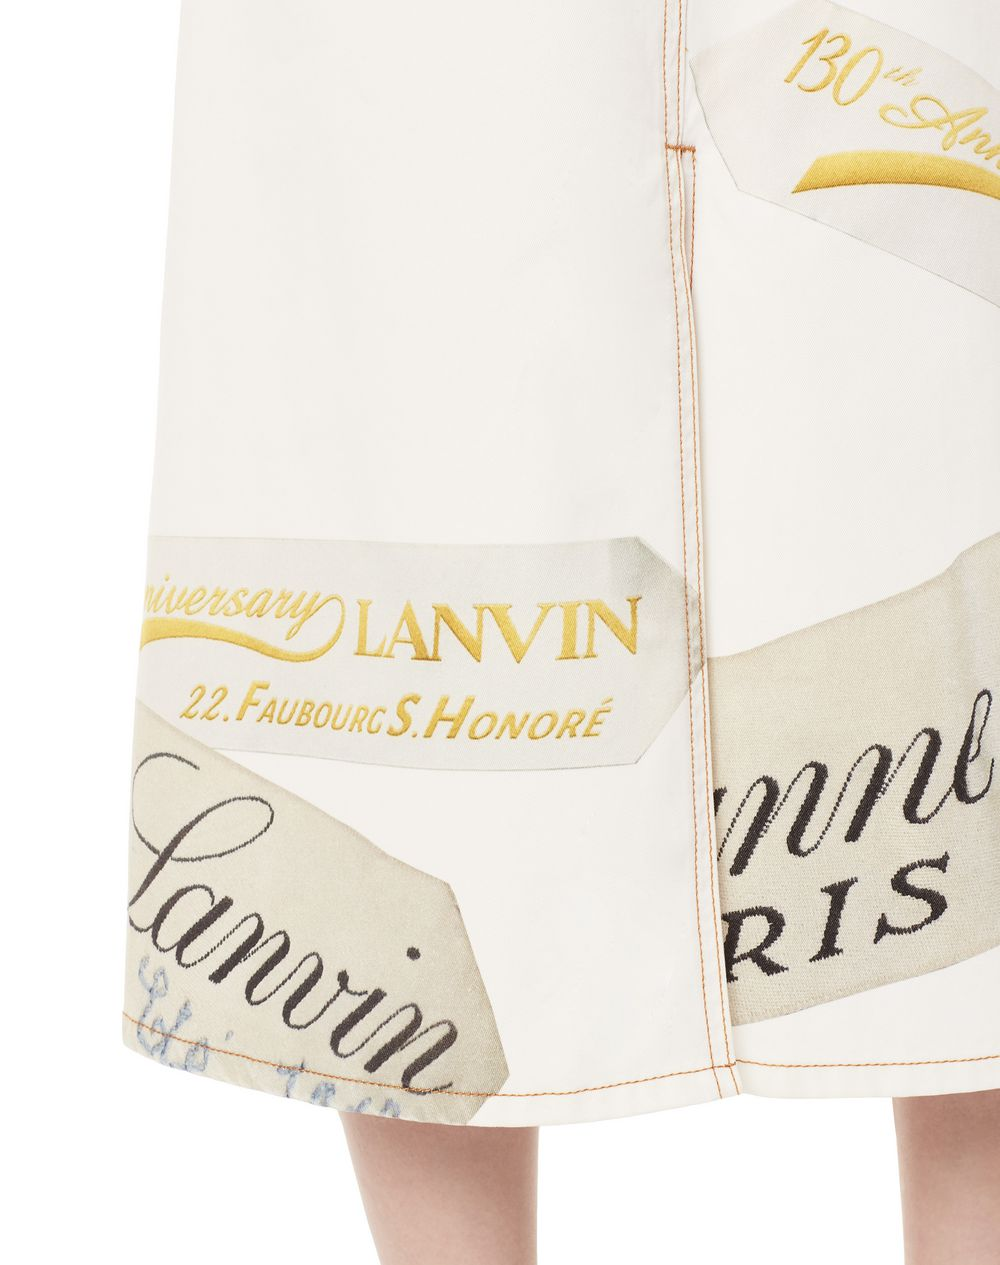 130 YEARS LANVIN LABEL PRINT DENIM MIDI SKIRT - Lanvin